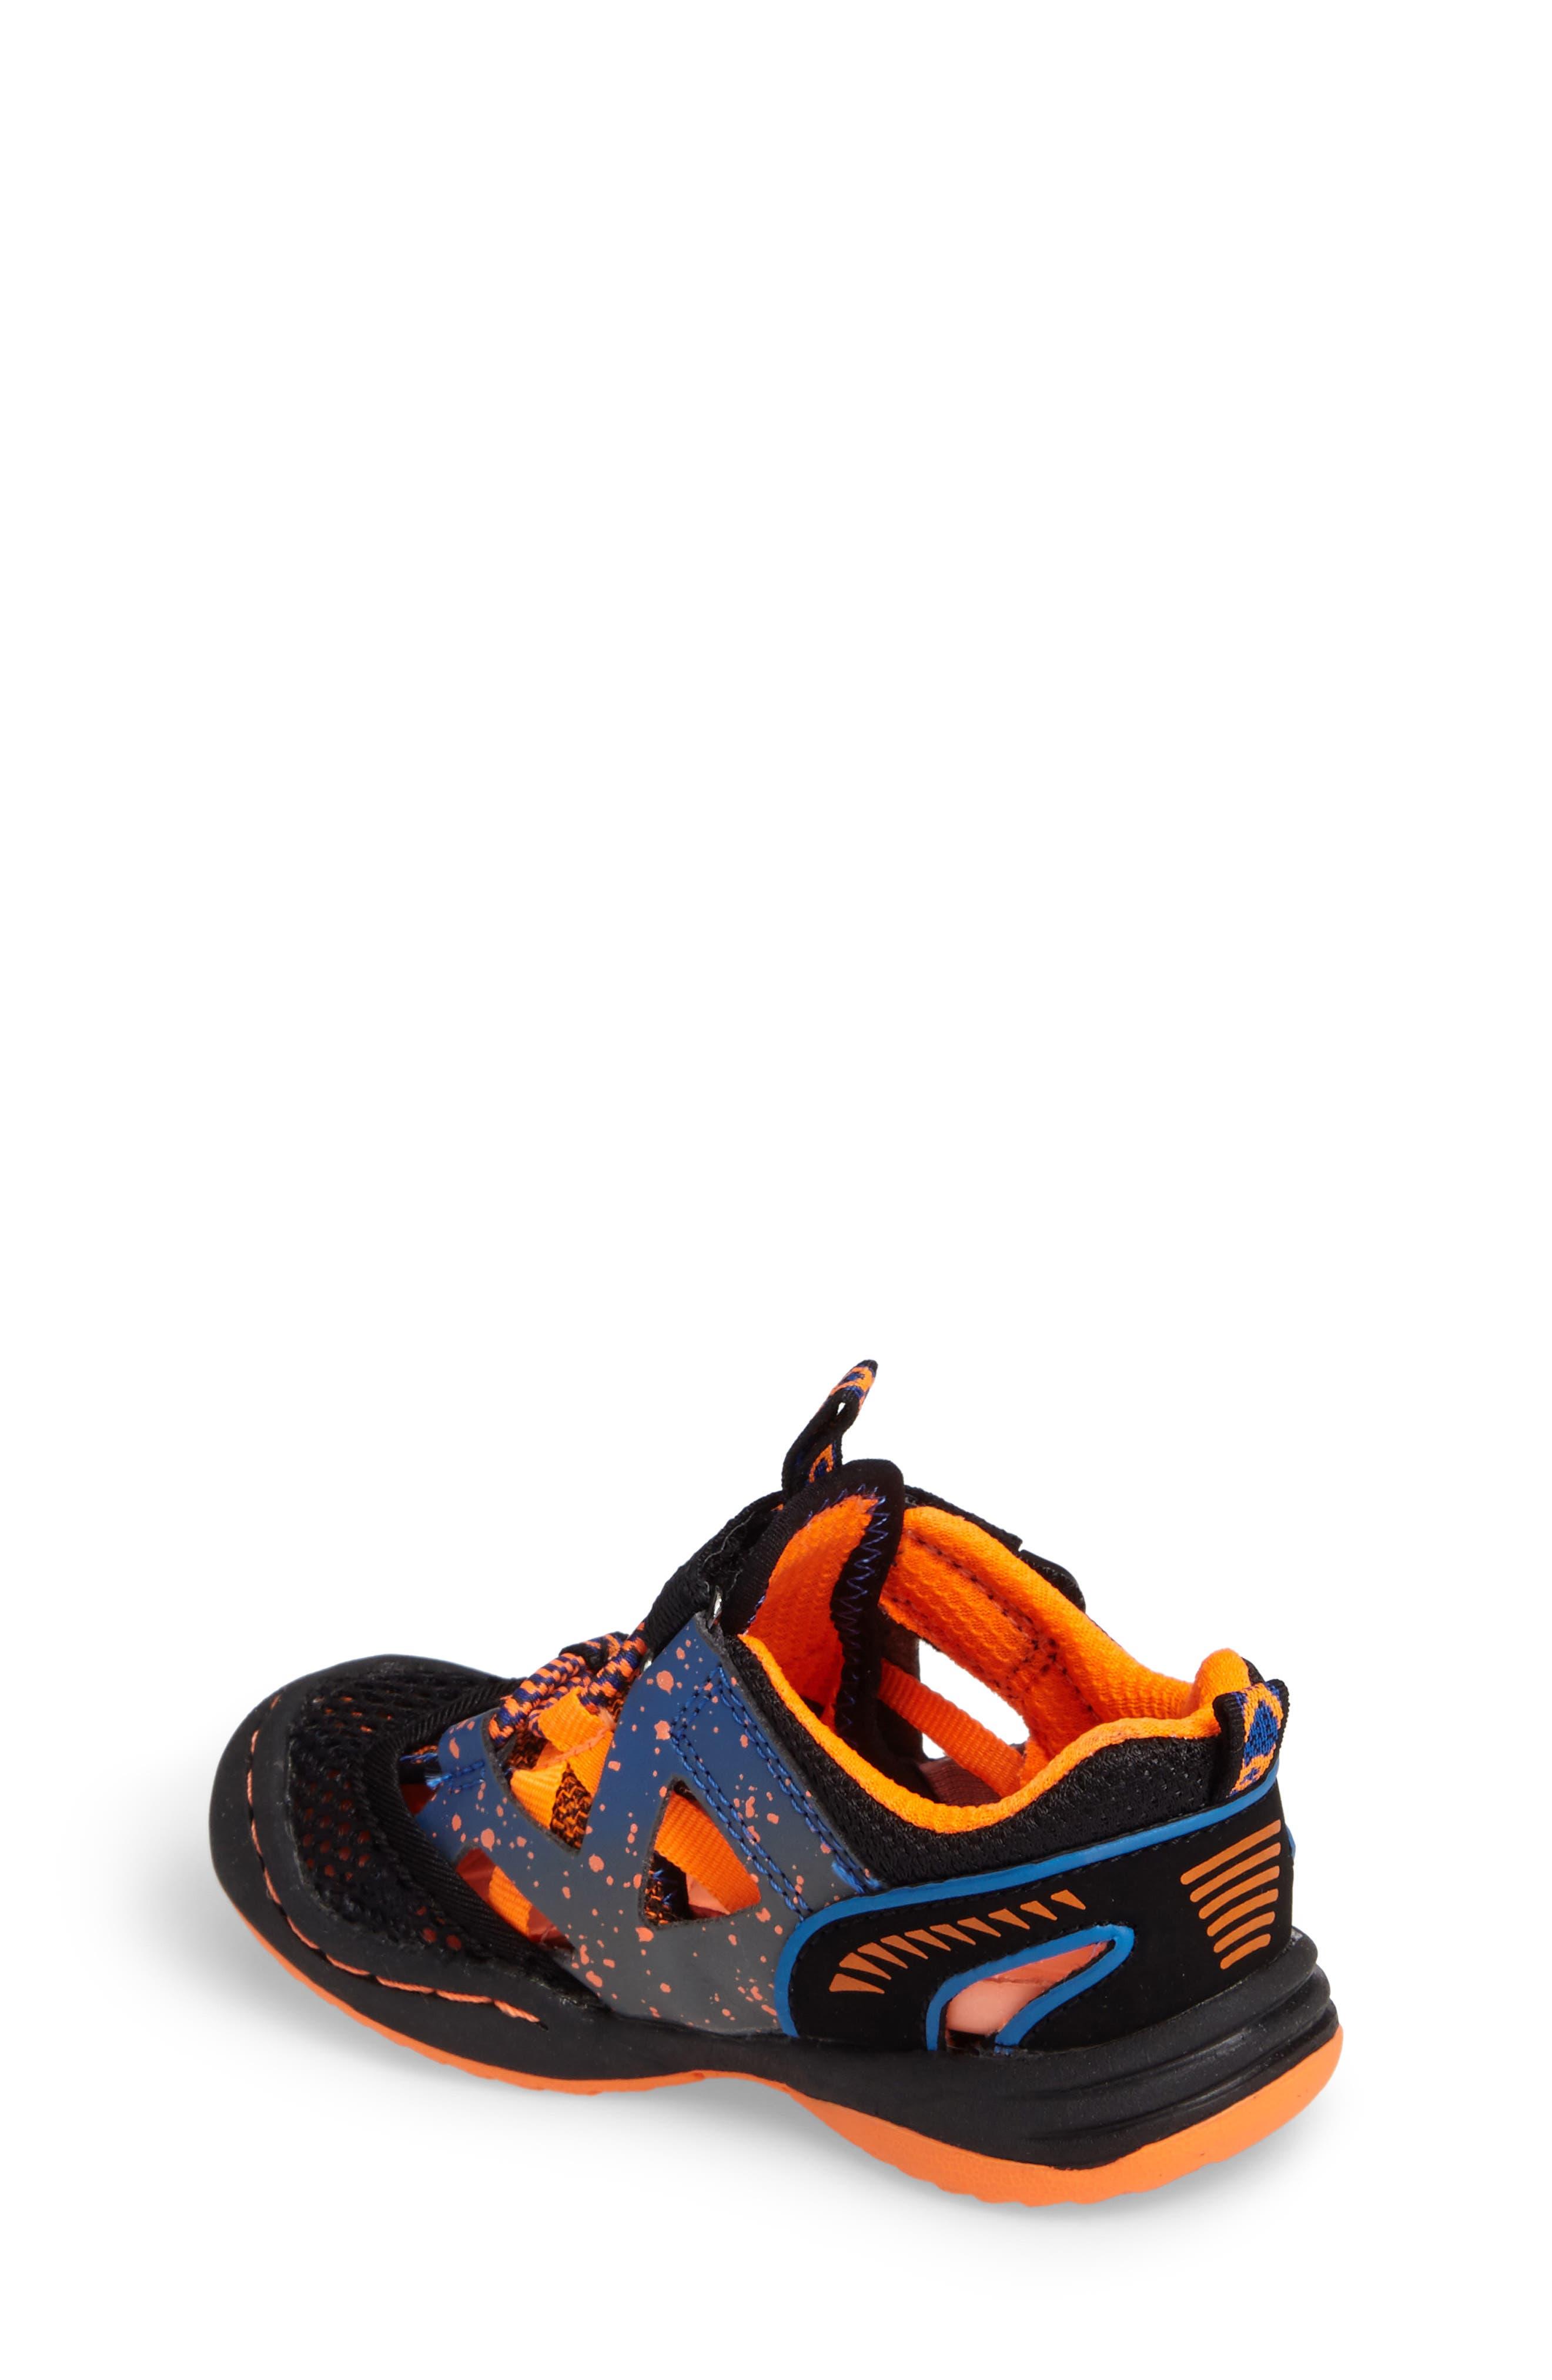 Squamata Sport Sneaker,                             Alternate thumbnail 2, color,                             Black/ Orange